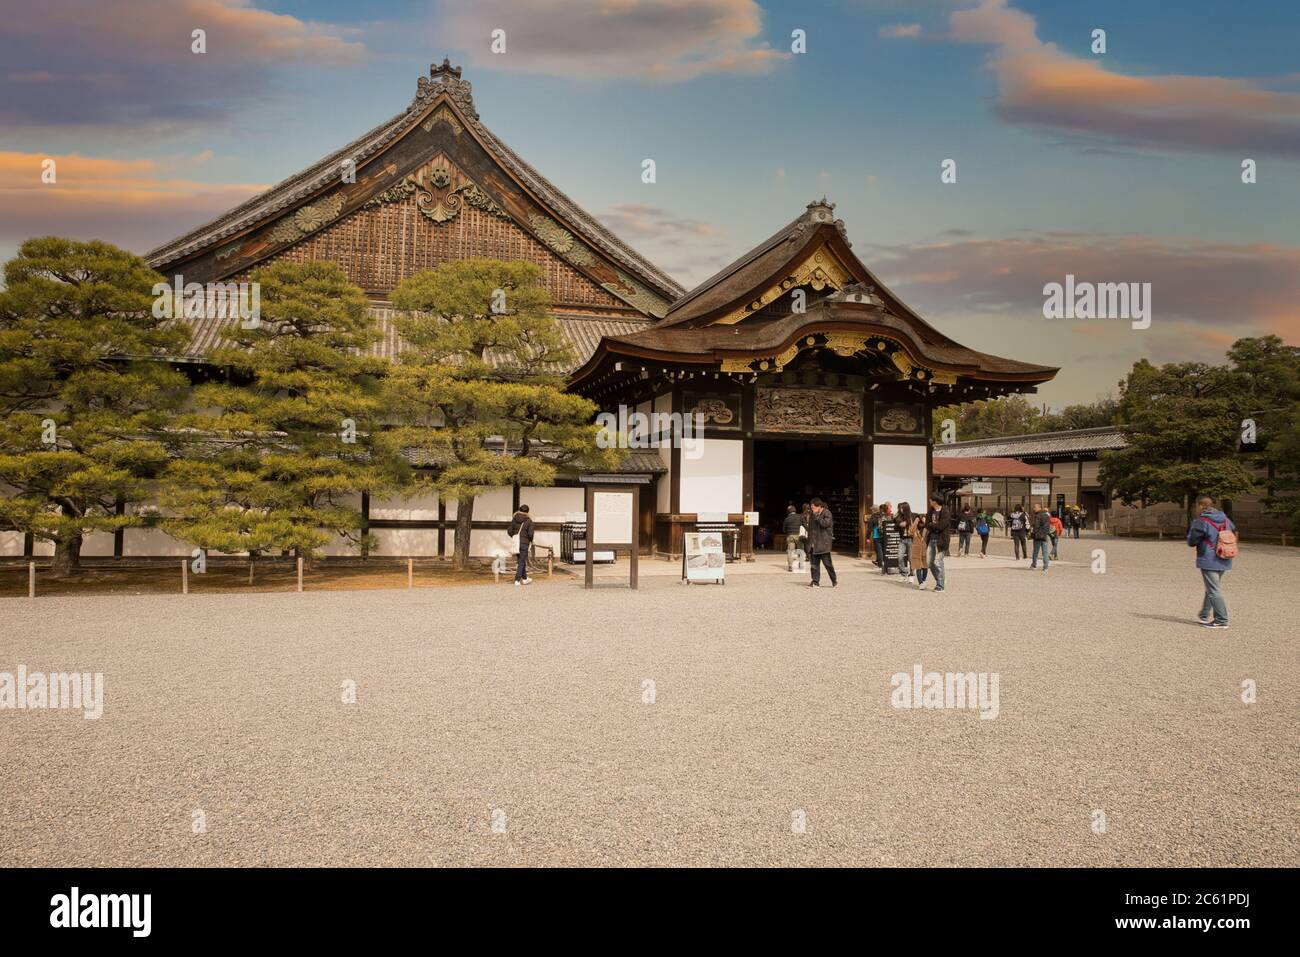 Niroshima and Honmaru palaces in japan Stock Photo